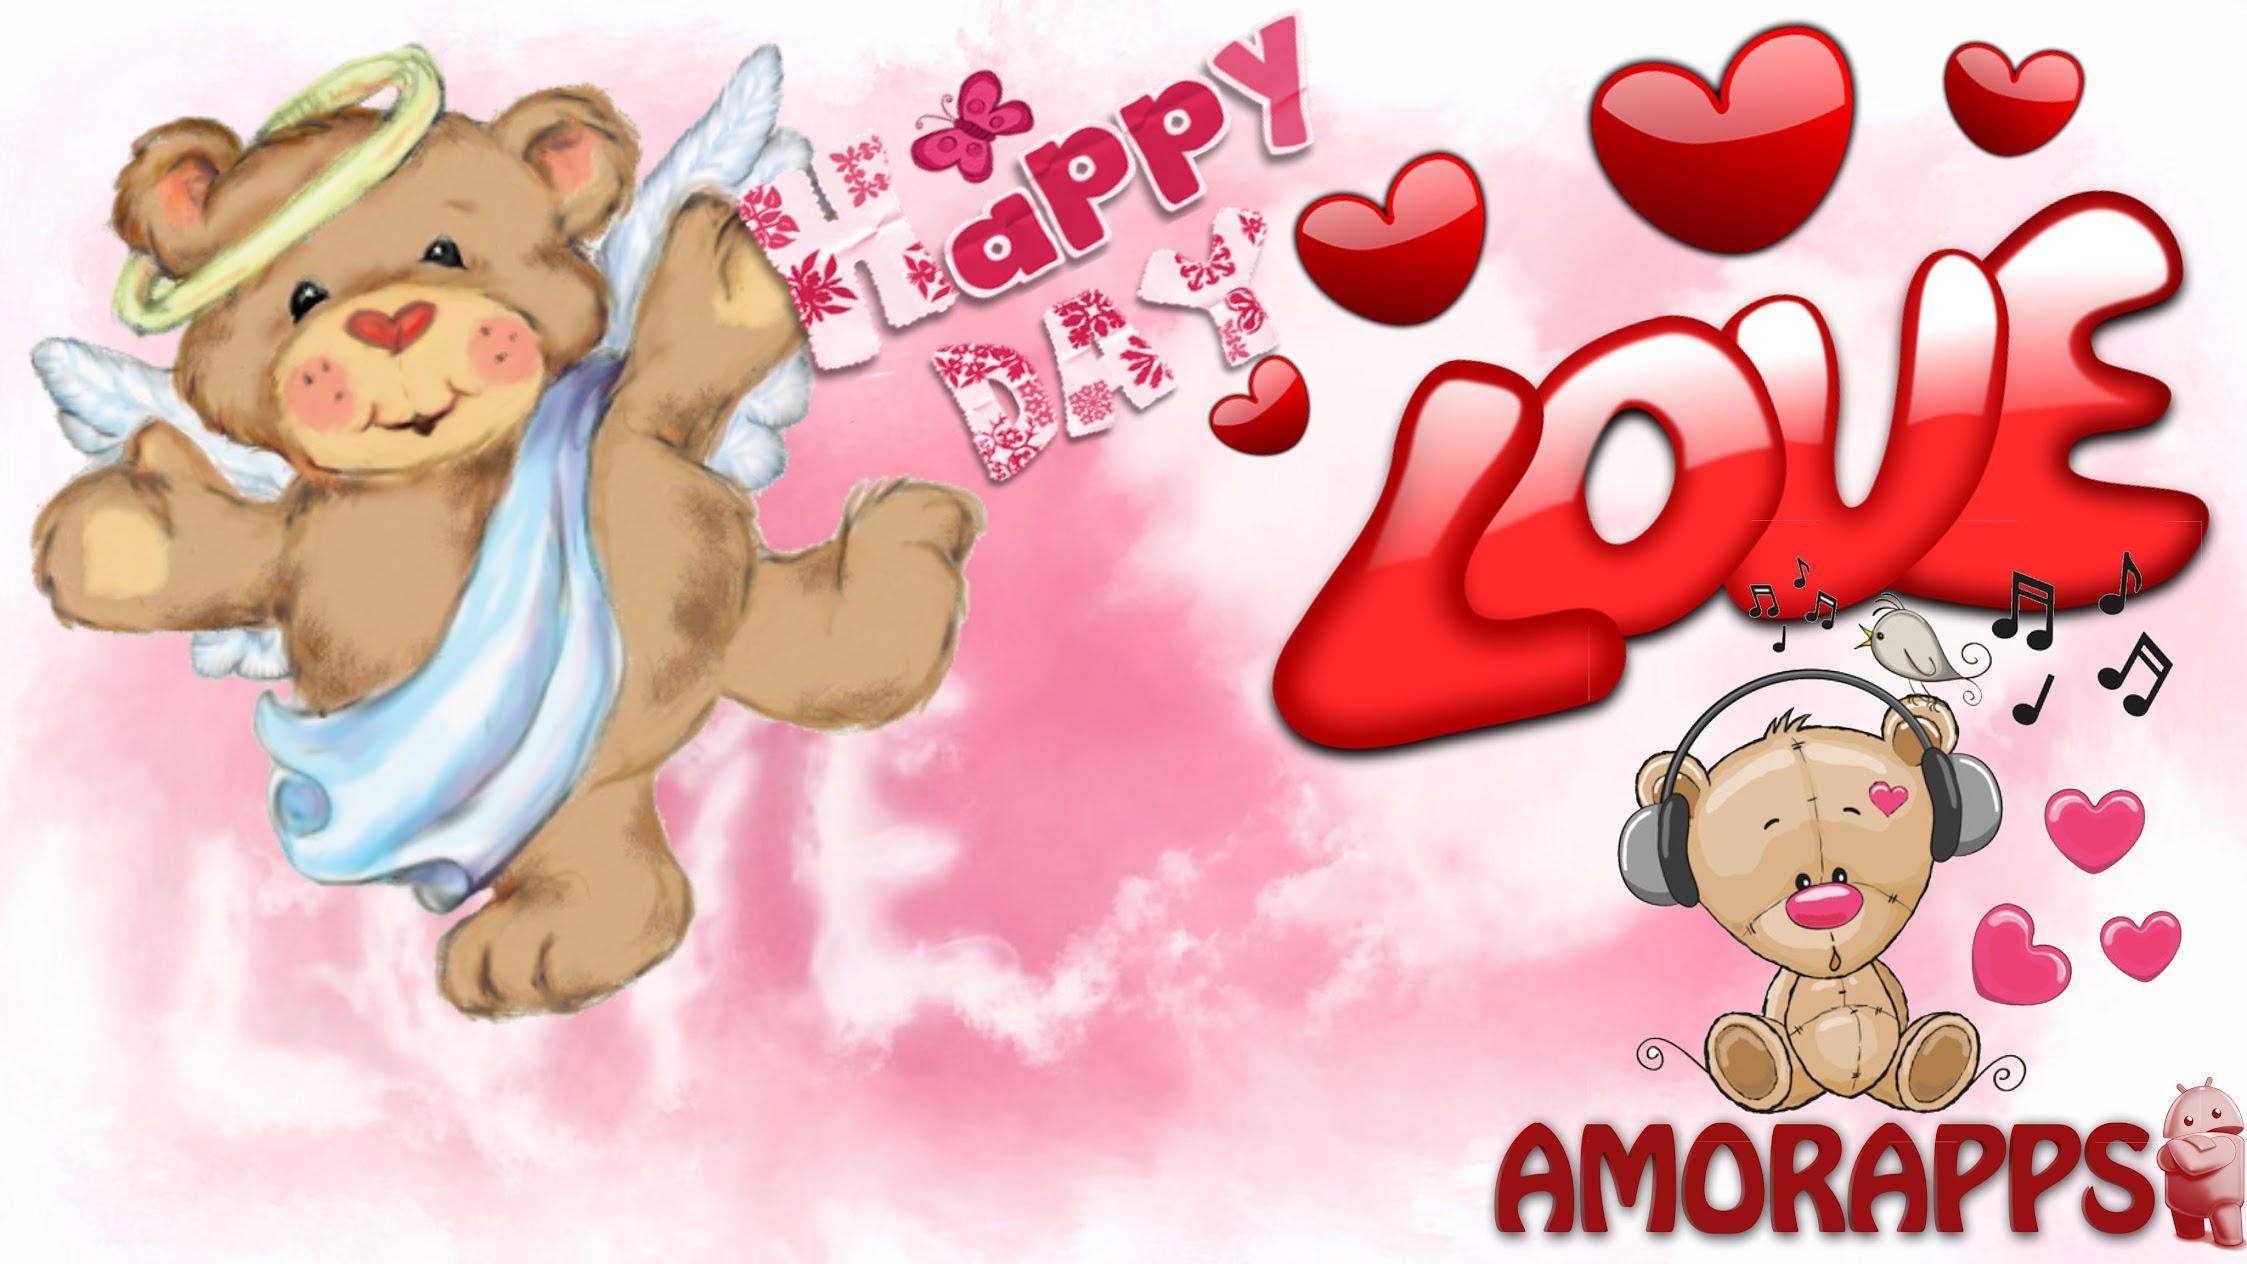 amor apps